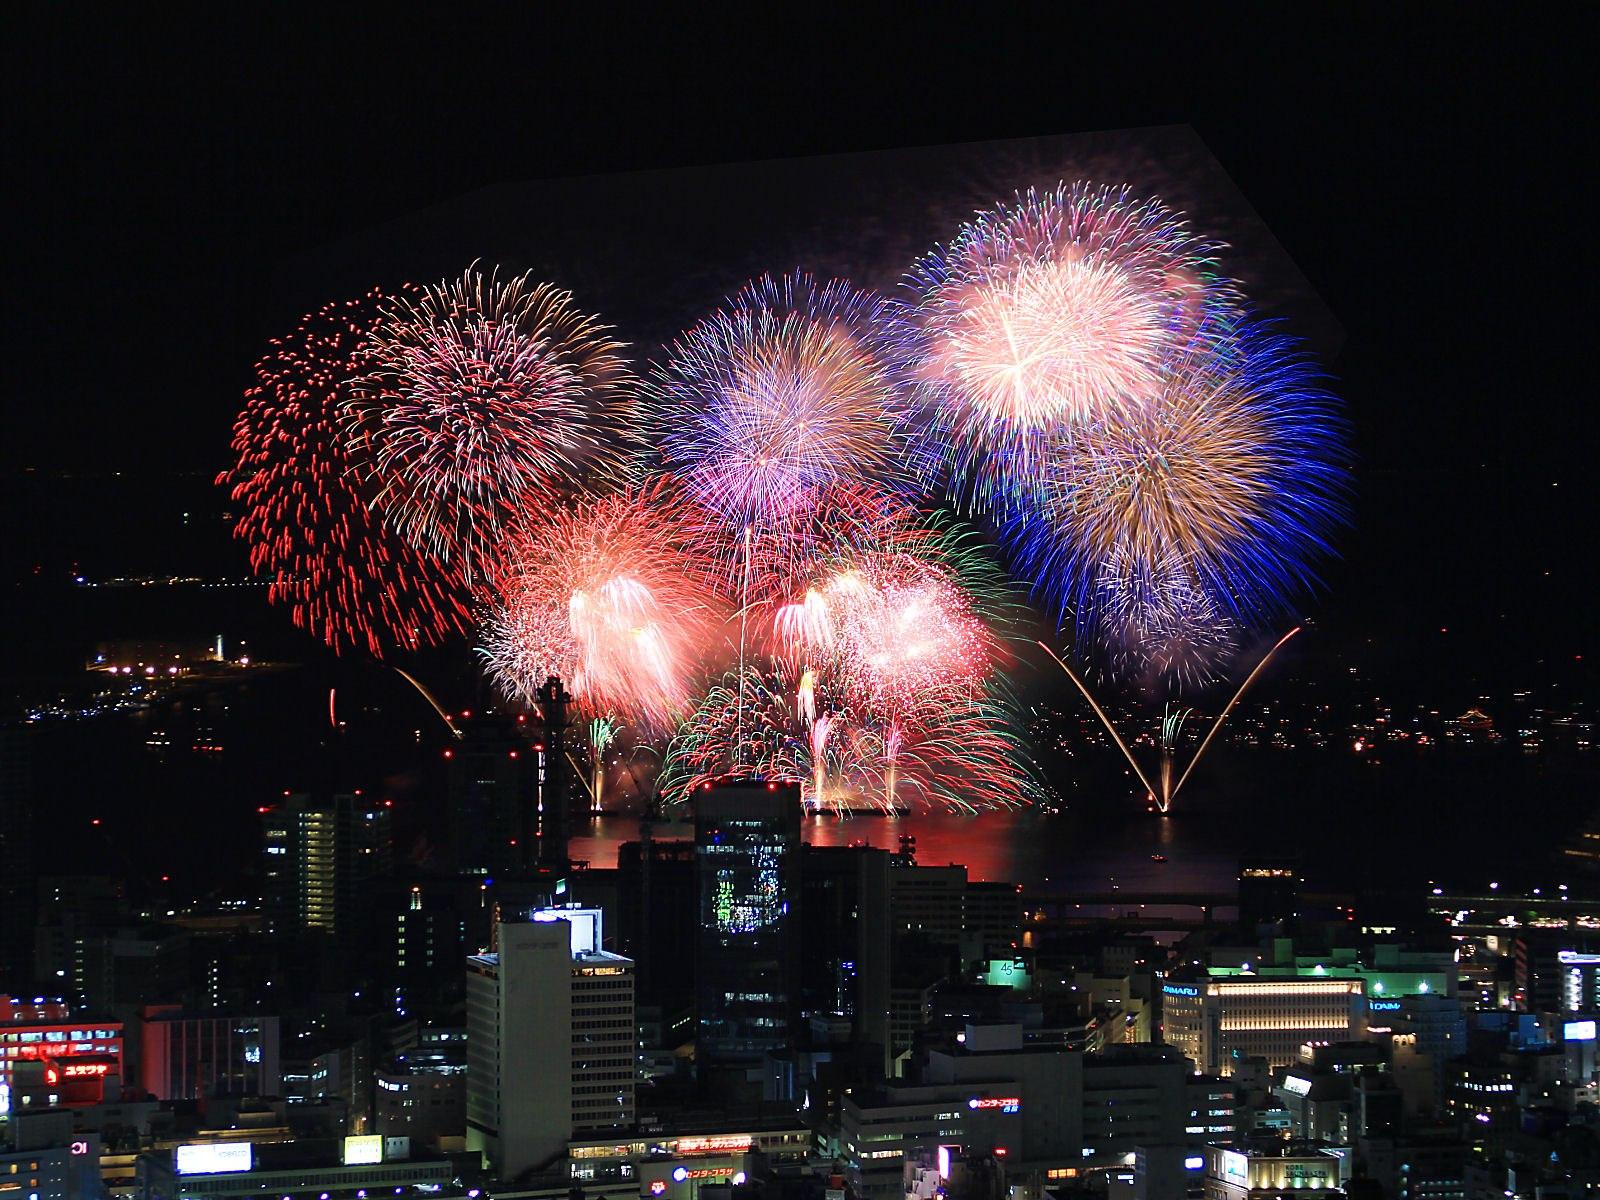 Wallpaper Fireworks Holidays 1600x1200